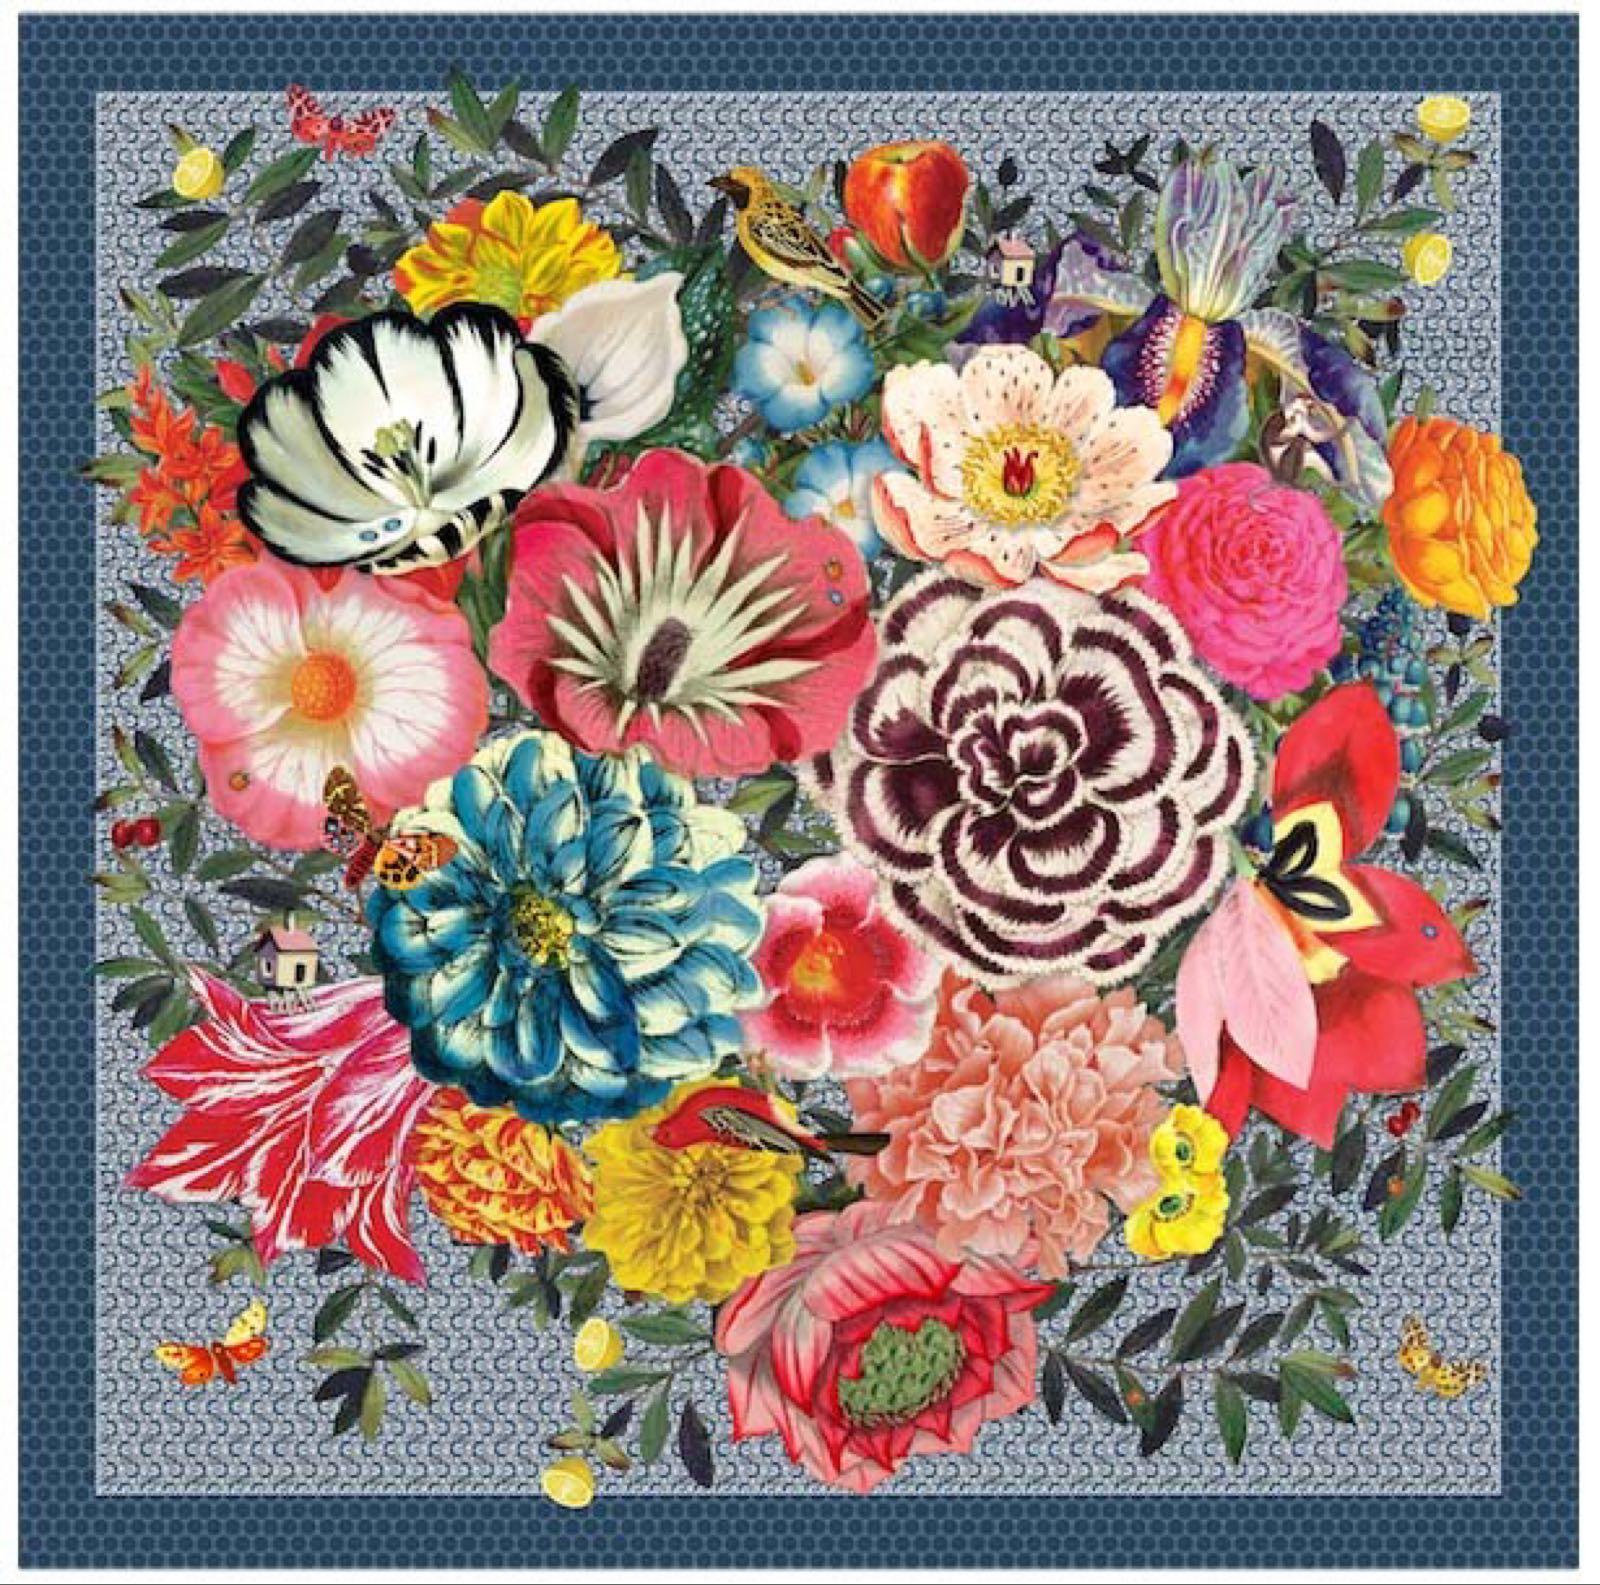 Pip studio Flowers 100% silk scarf was £65